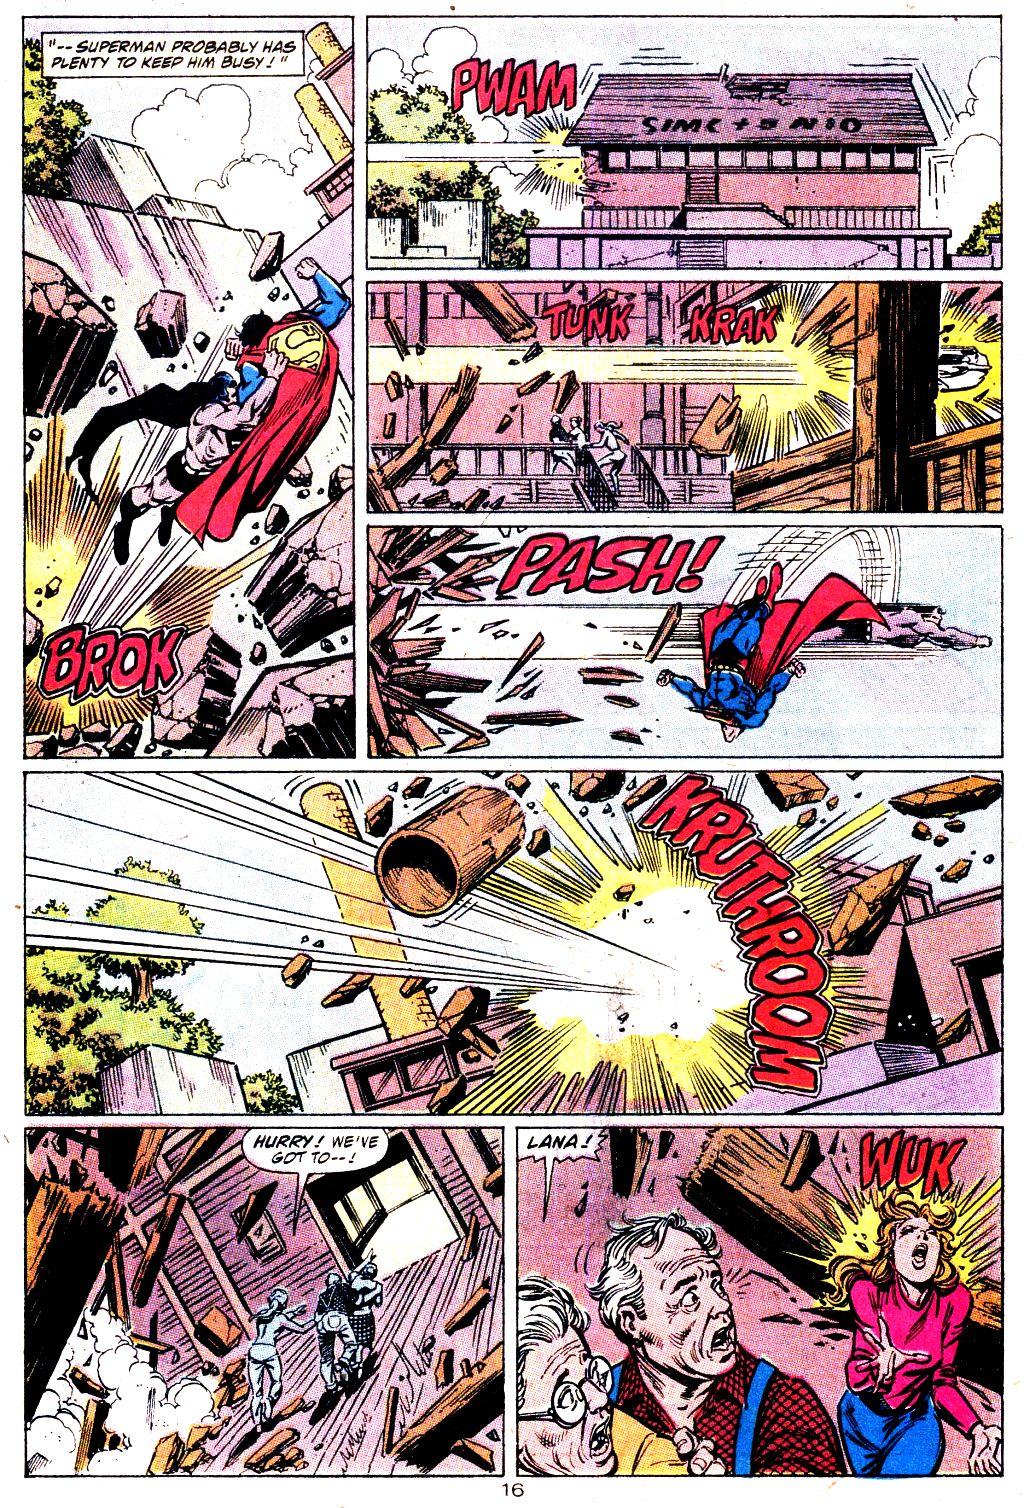 Action Comics (1938) 644 Page 16